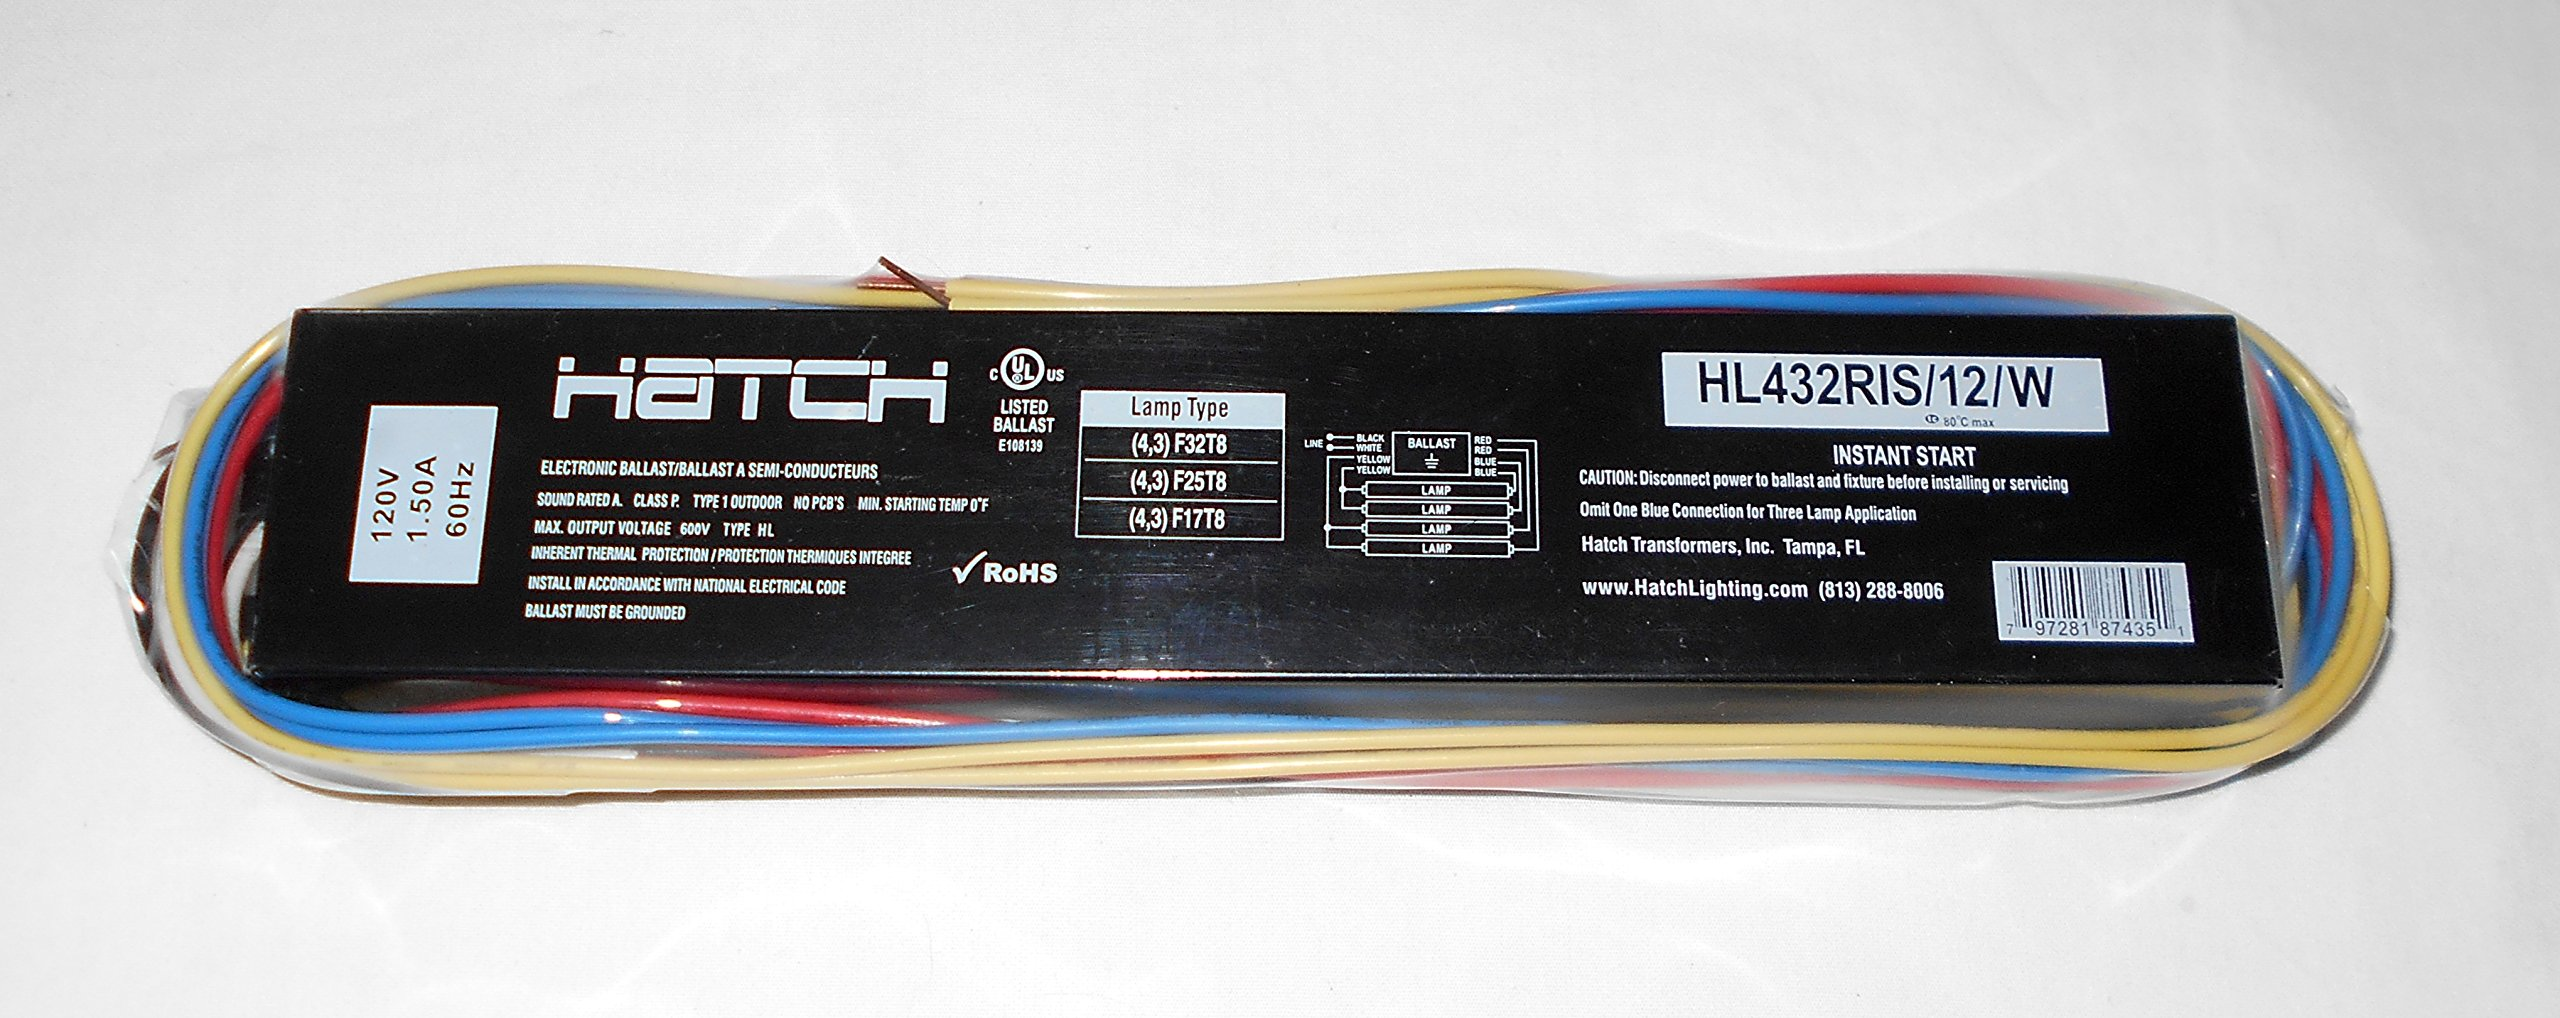 HL432RIS/12/W 4 Lamp T8 Electronic Ballast